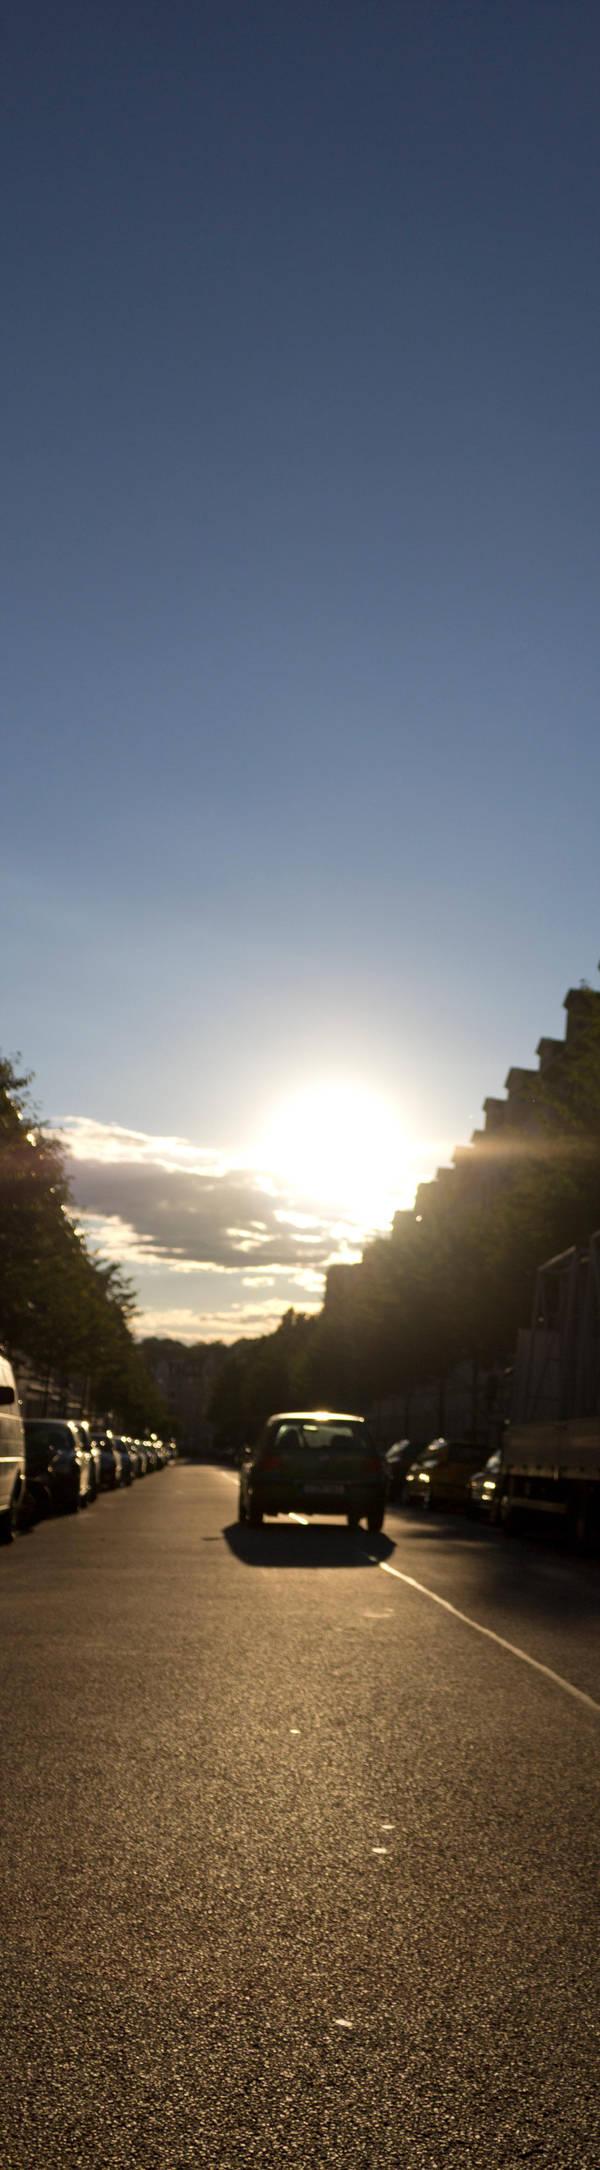 Hello Sunset by bitstarr